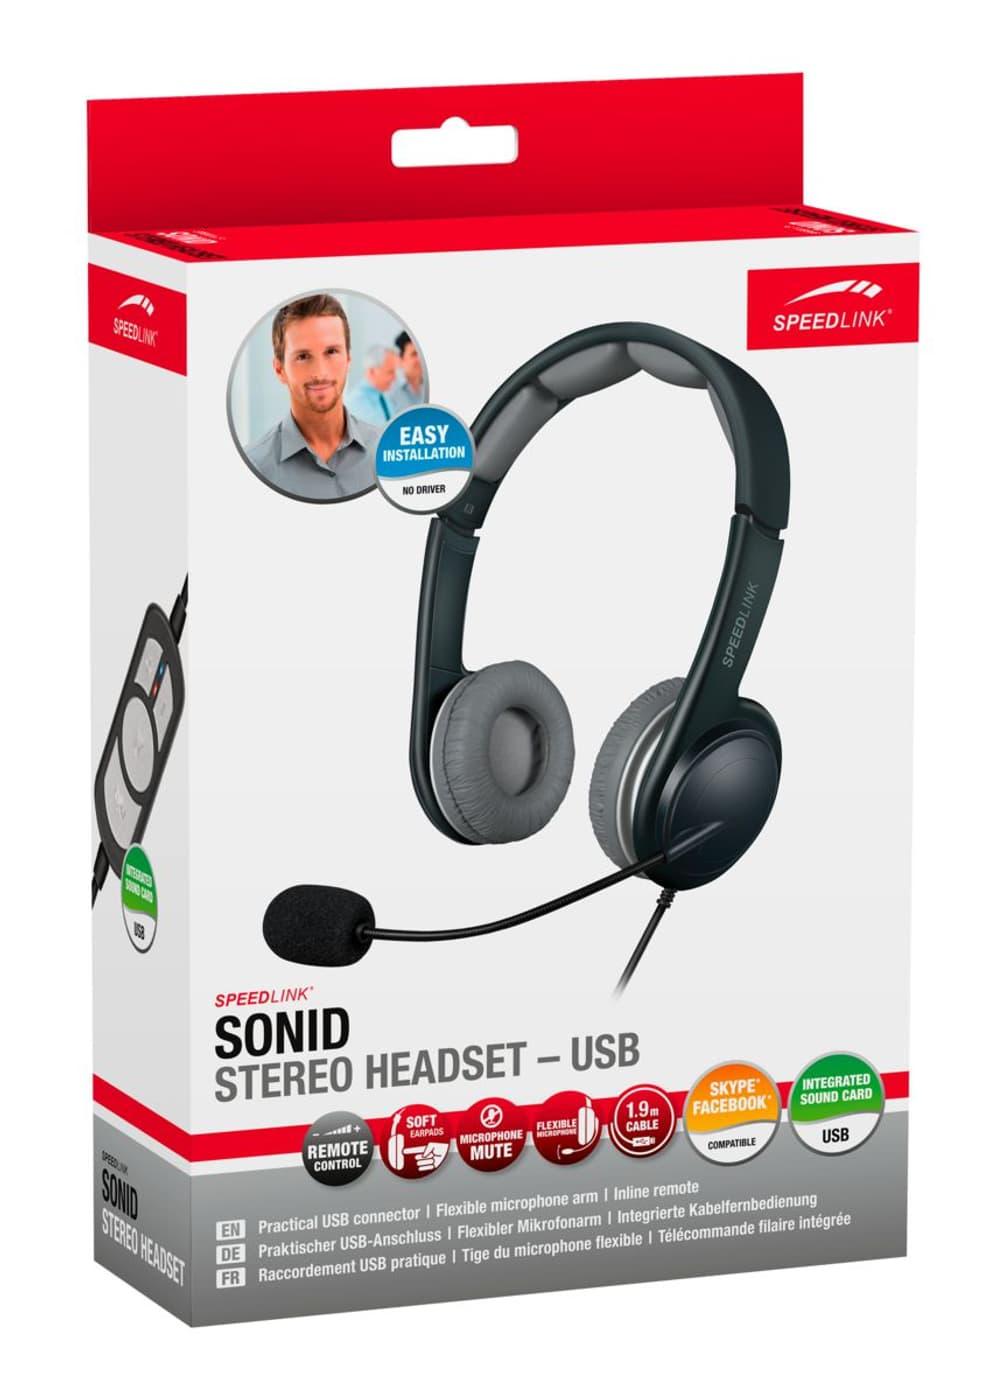 speedlink sonid stereo headset usb migros. Black Bedroom Furniture Sets. Home Design Ideas